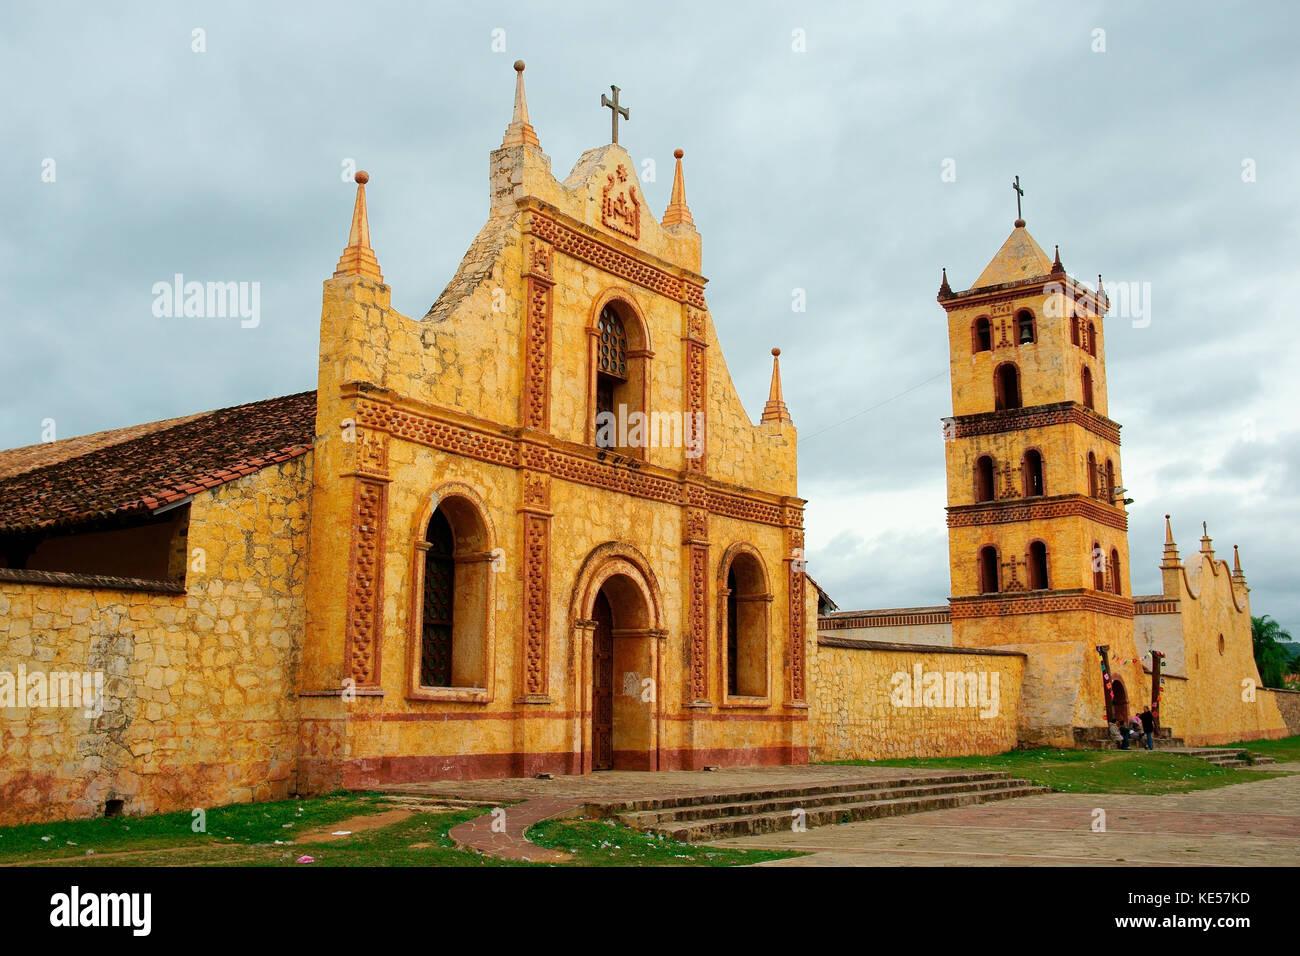 La missione dei gesuiti, riduzione dei gesuiti, San José de chiquitos, Santa Cruz, Bolivia Immagini Stock